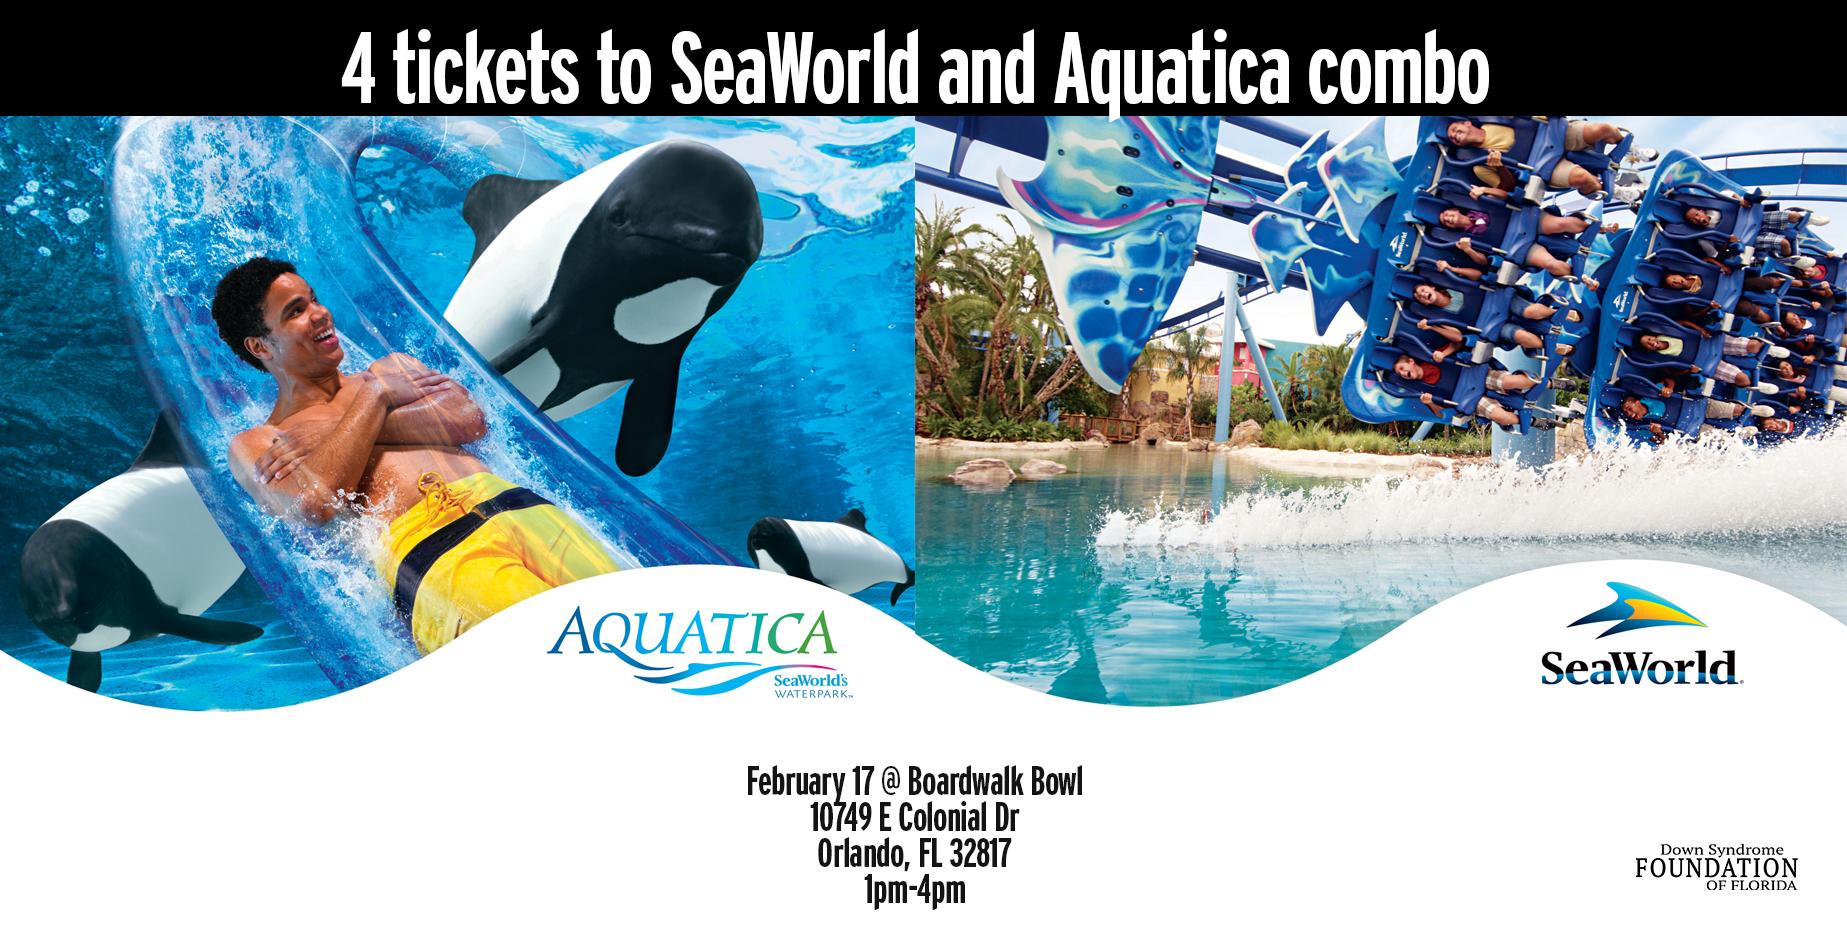 Seaworld and aquatica